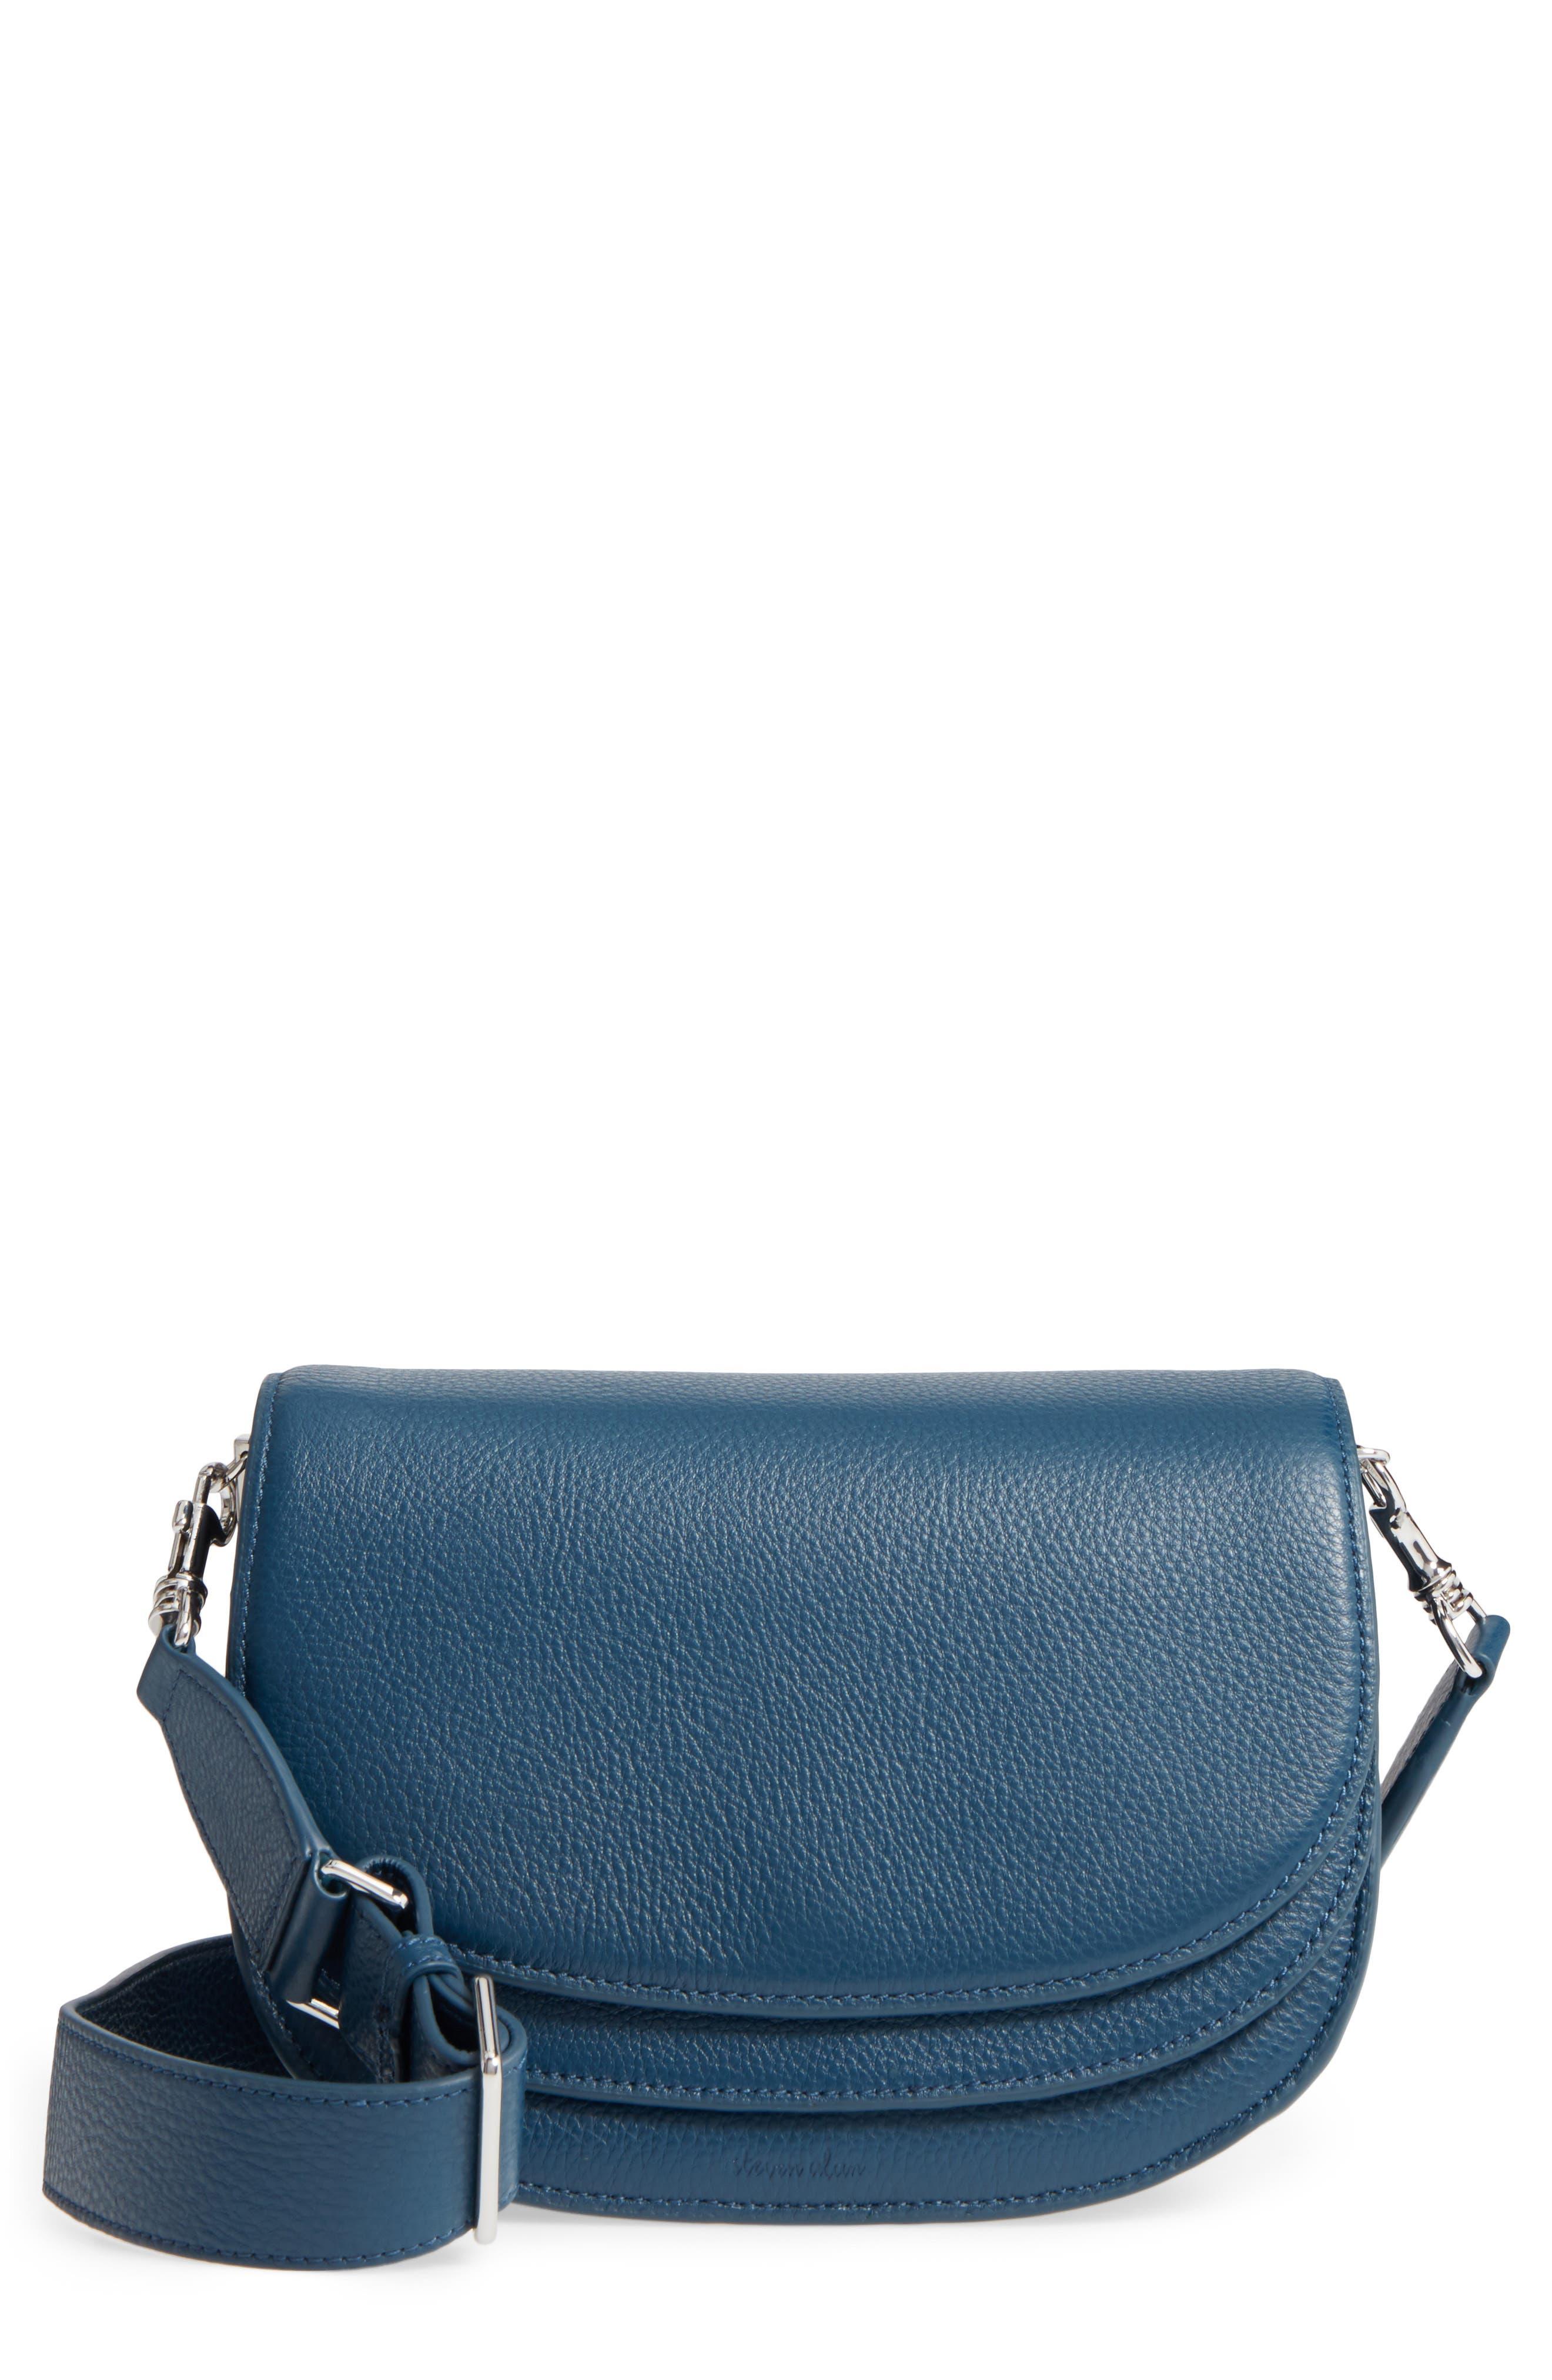 Landon Leather Crossbody Saddle Bag,                             Main thumbnail 2, color,